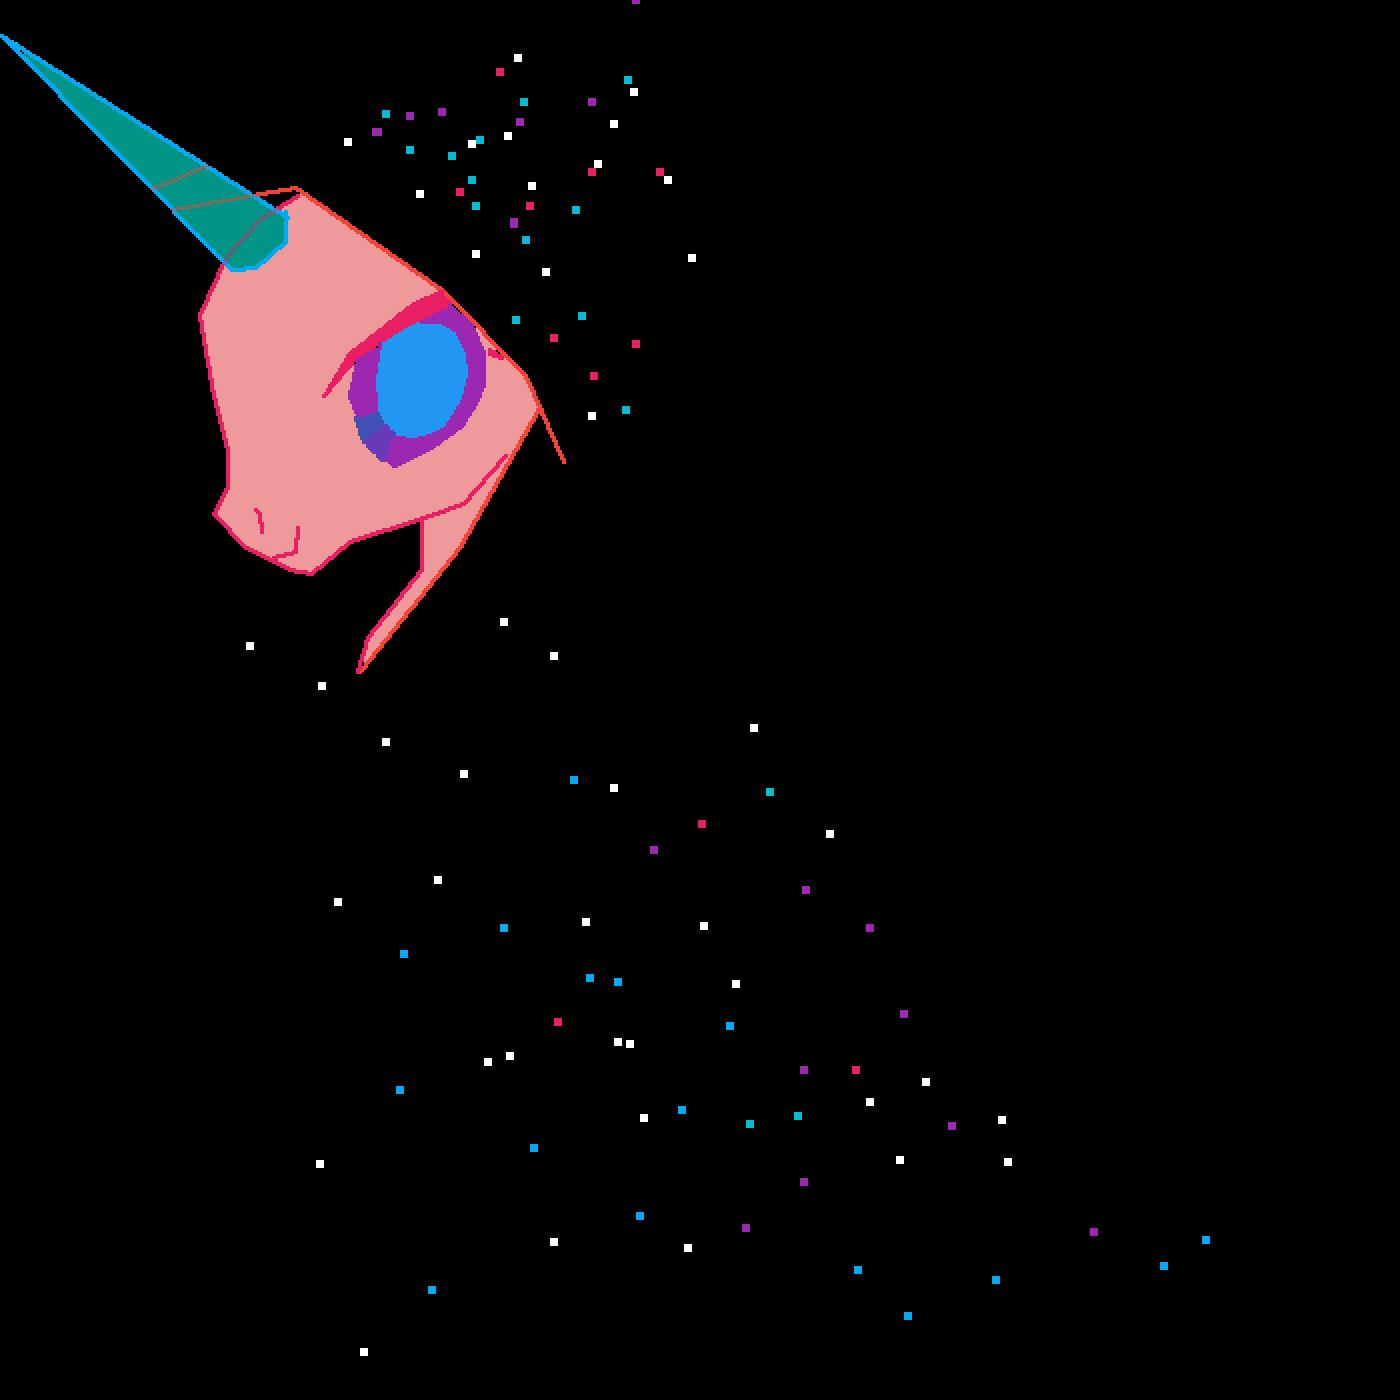 starry night unicorn by bunnybekah13